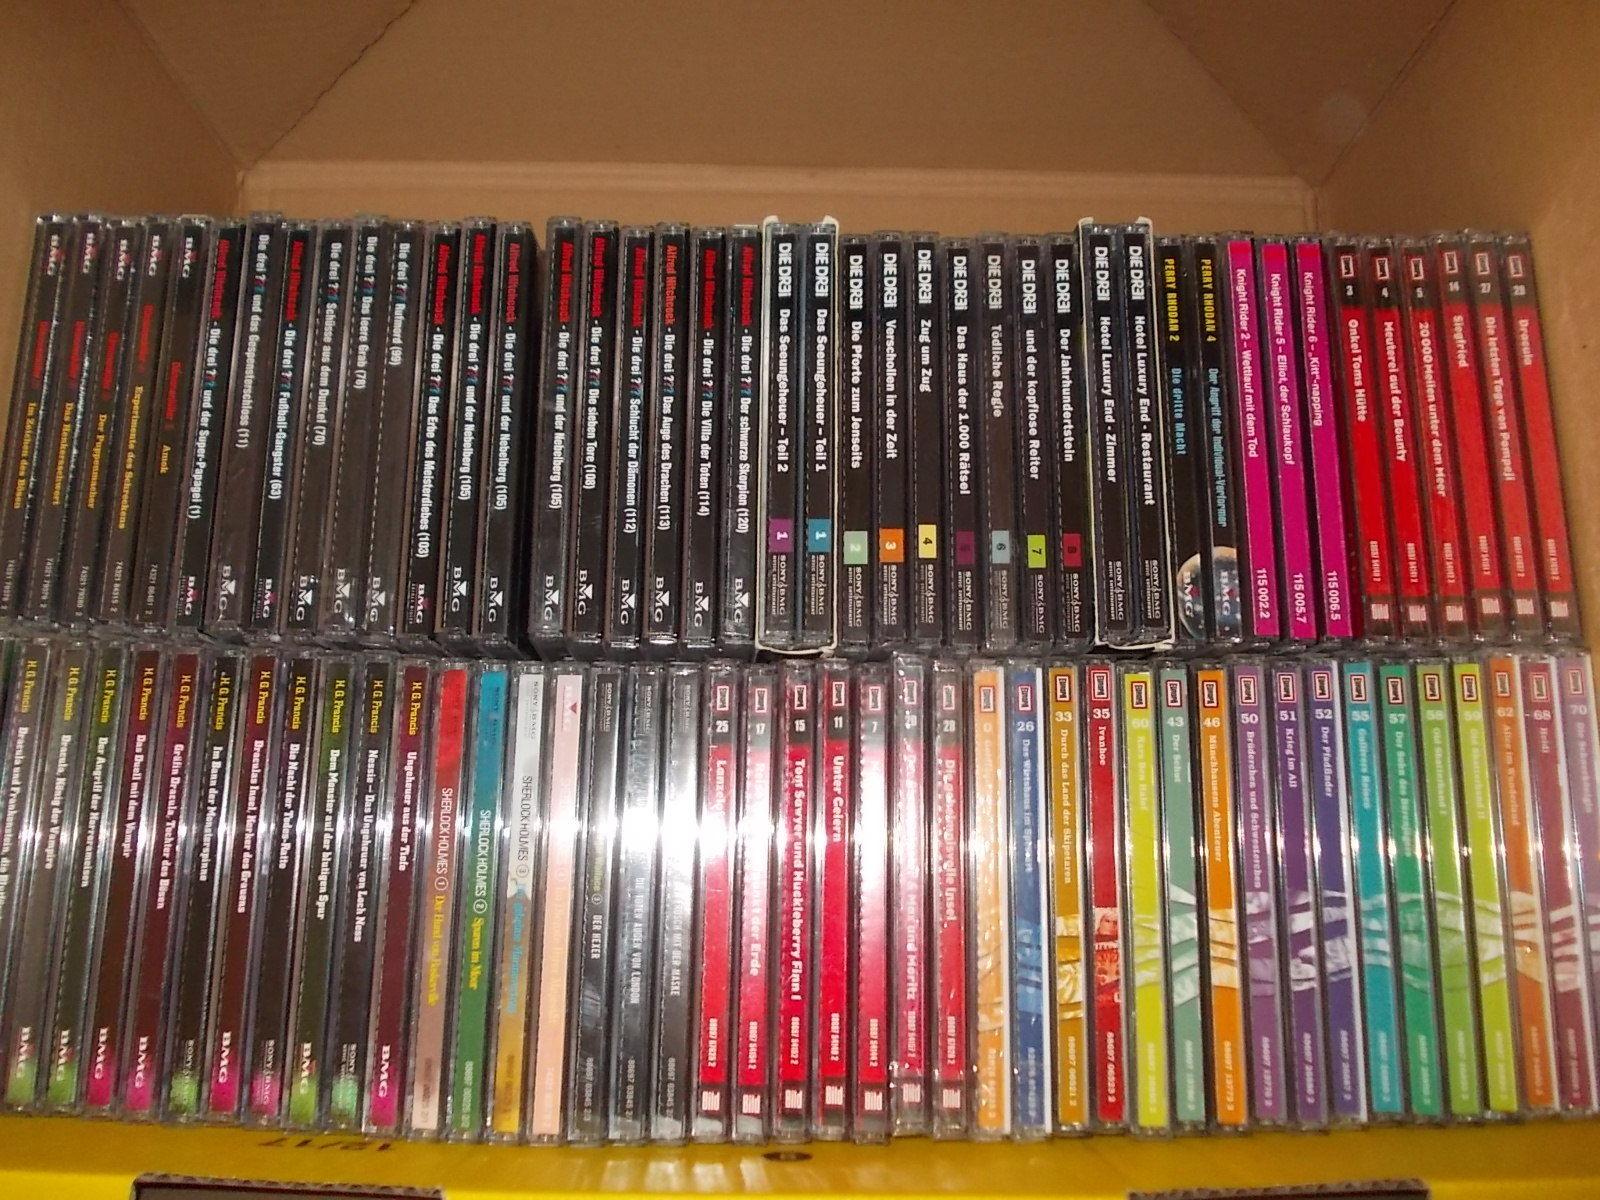 83 CD Hörspiele * Europa RDK * Gruselserie, Die Originale, Perry Rhodan, Dr3i um